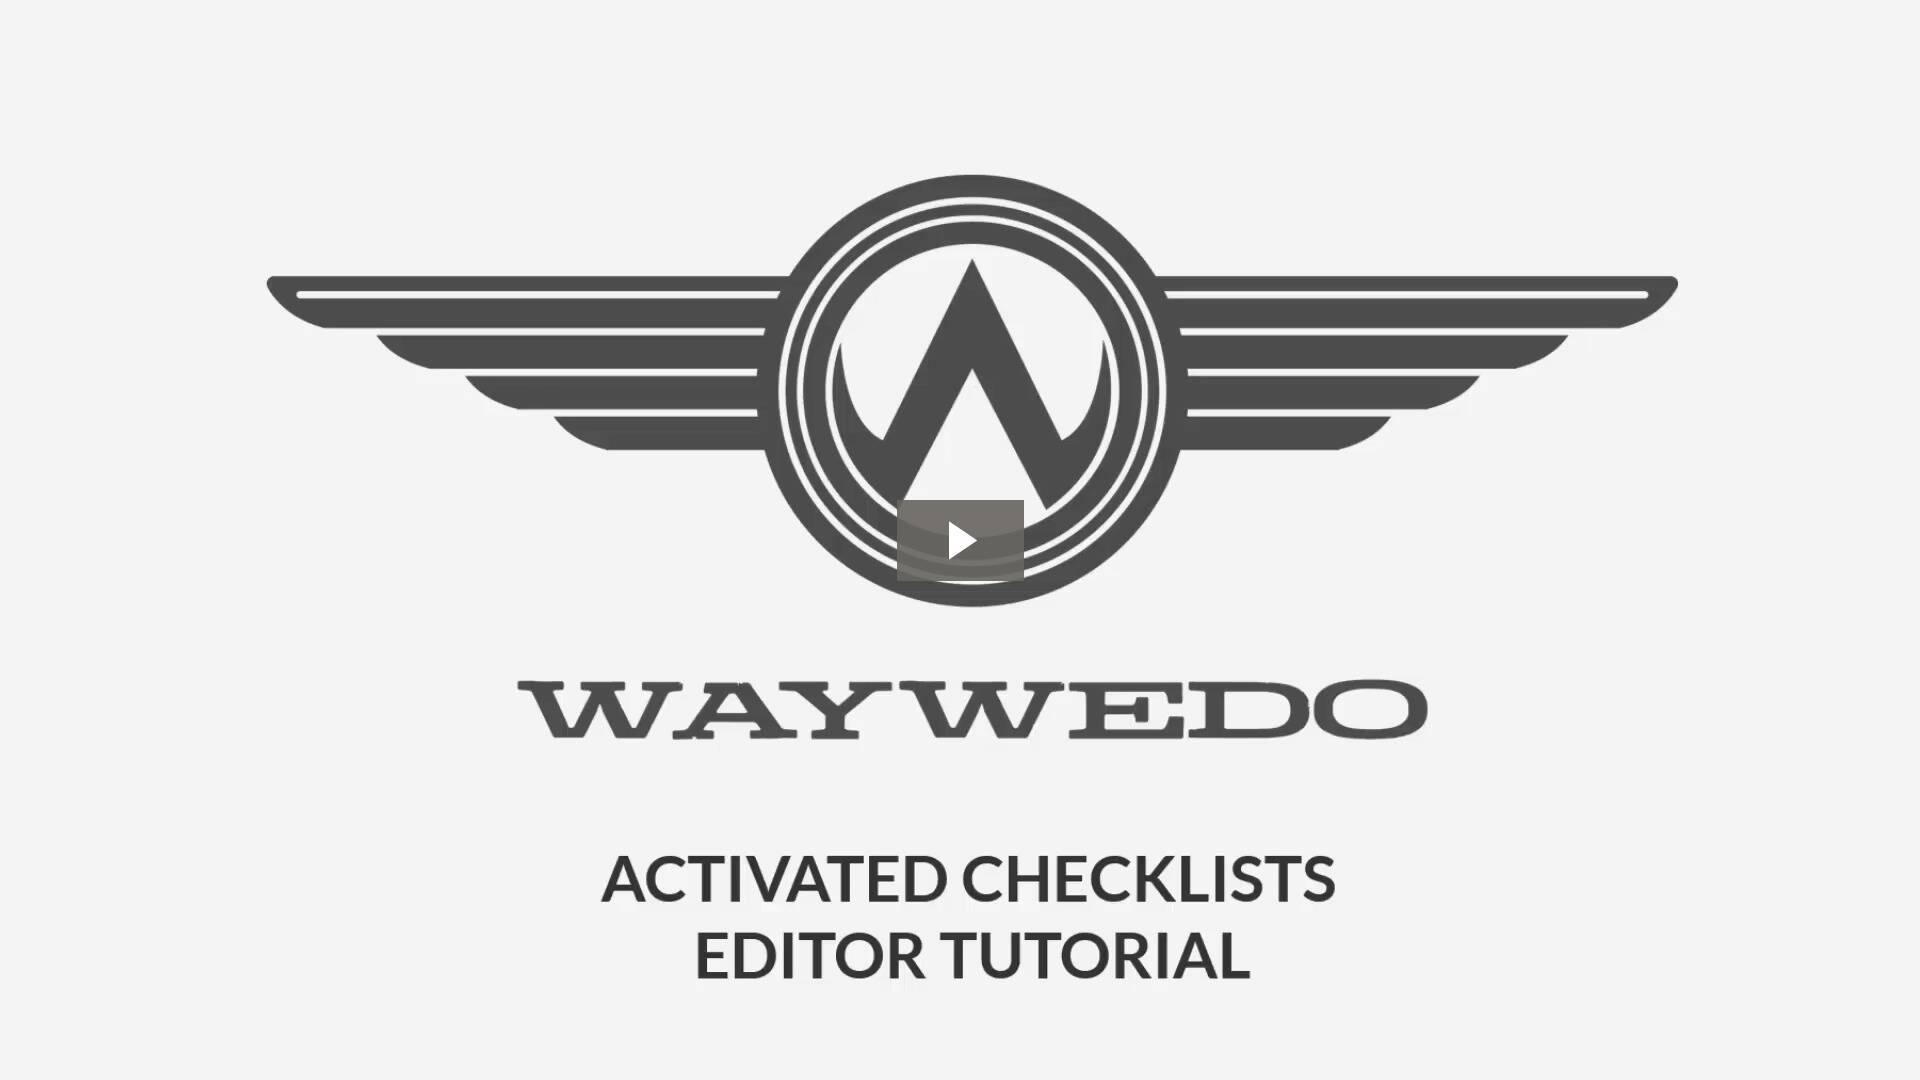 Way We Do - Activated Checklists - Editor Tutorial